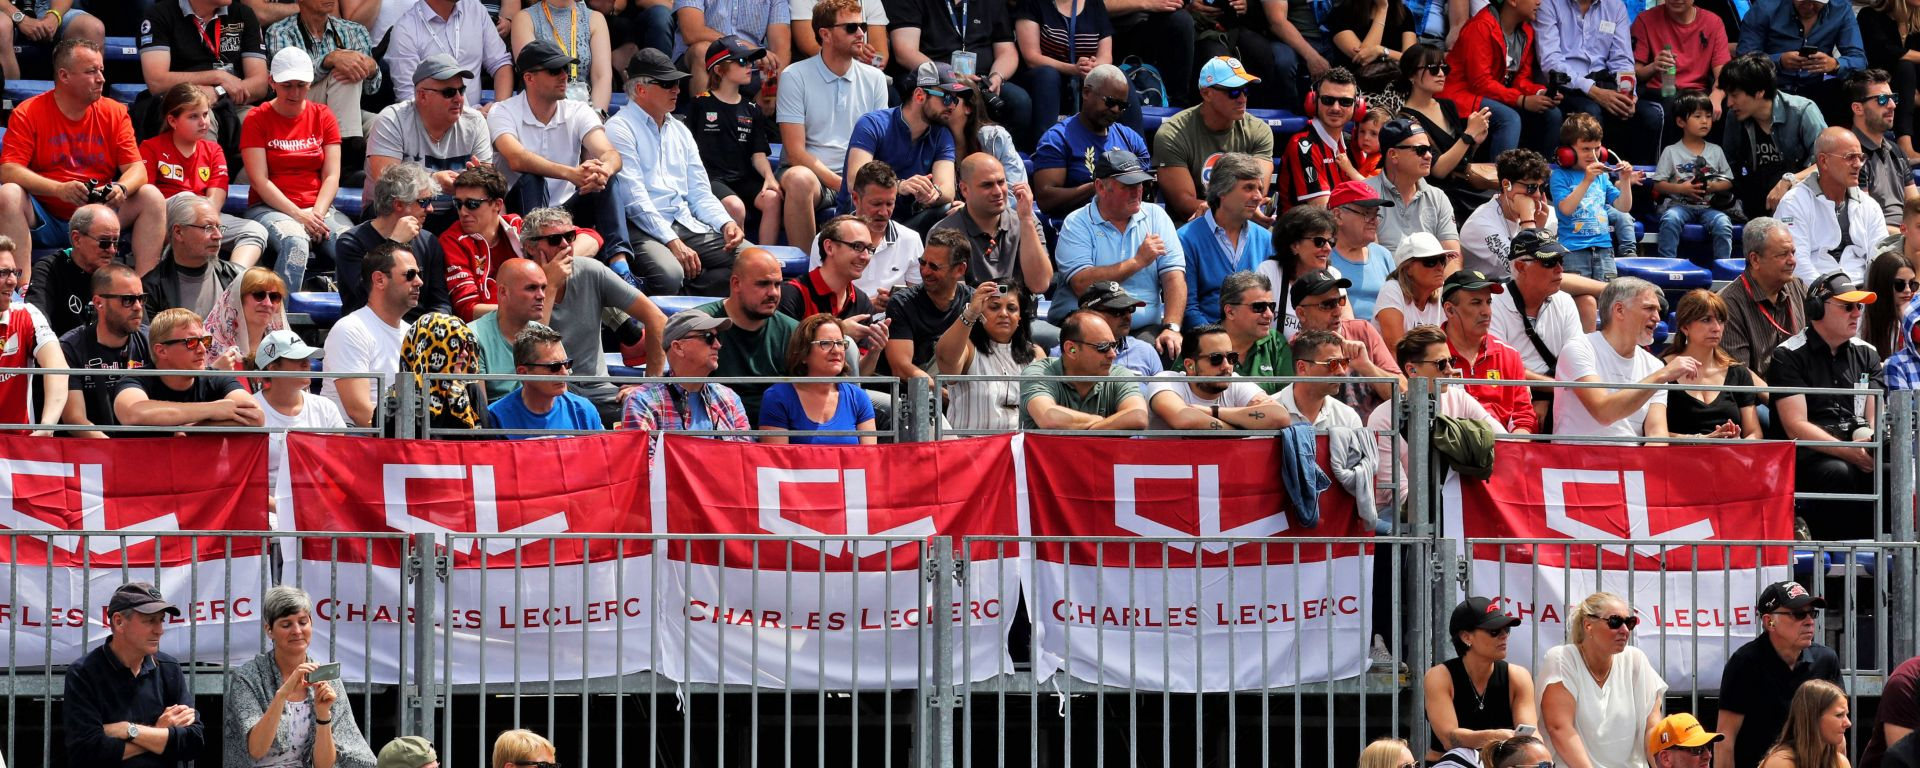 F1 2019: tifosi di Charles Leclerc in tribuna